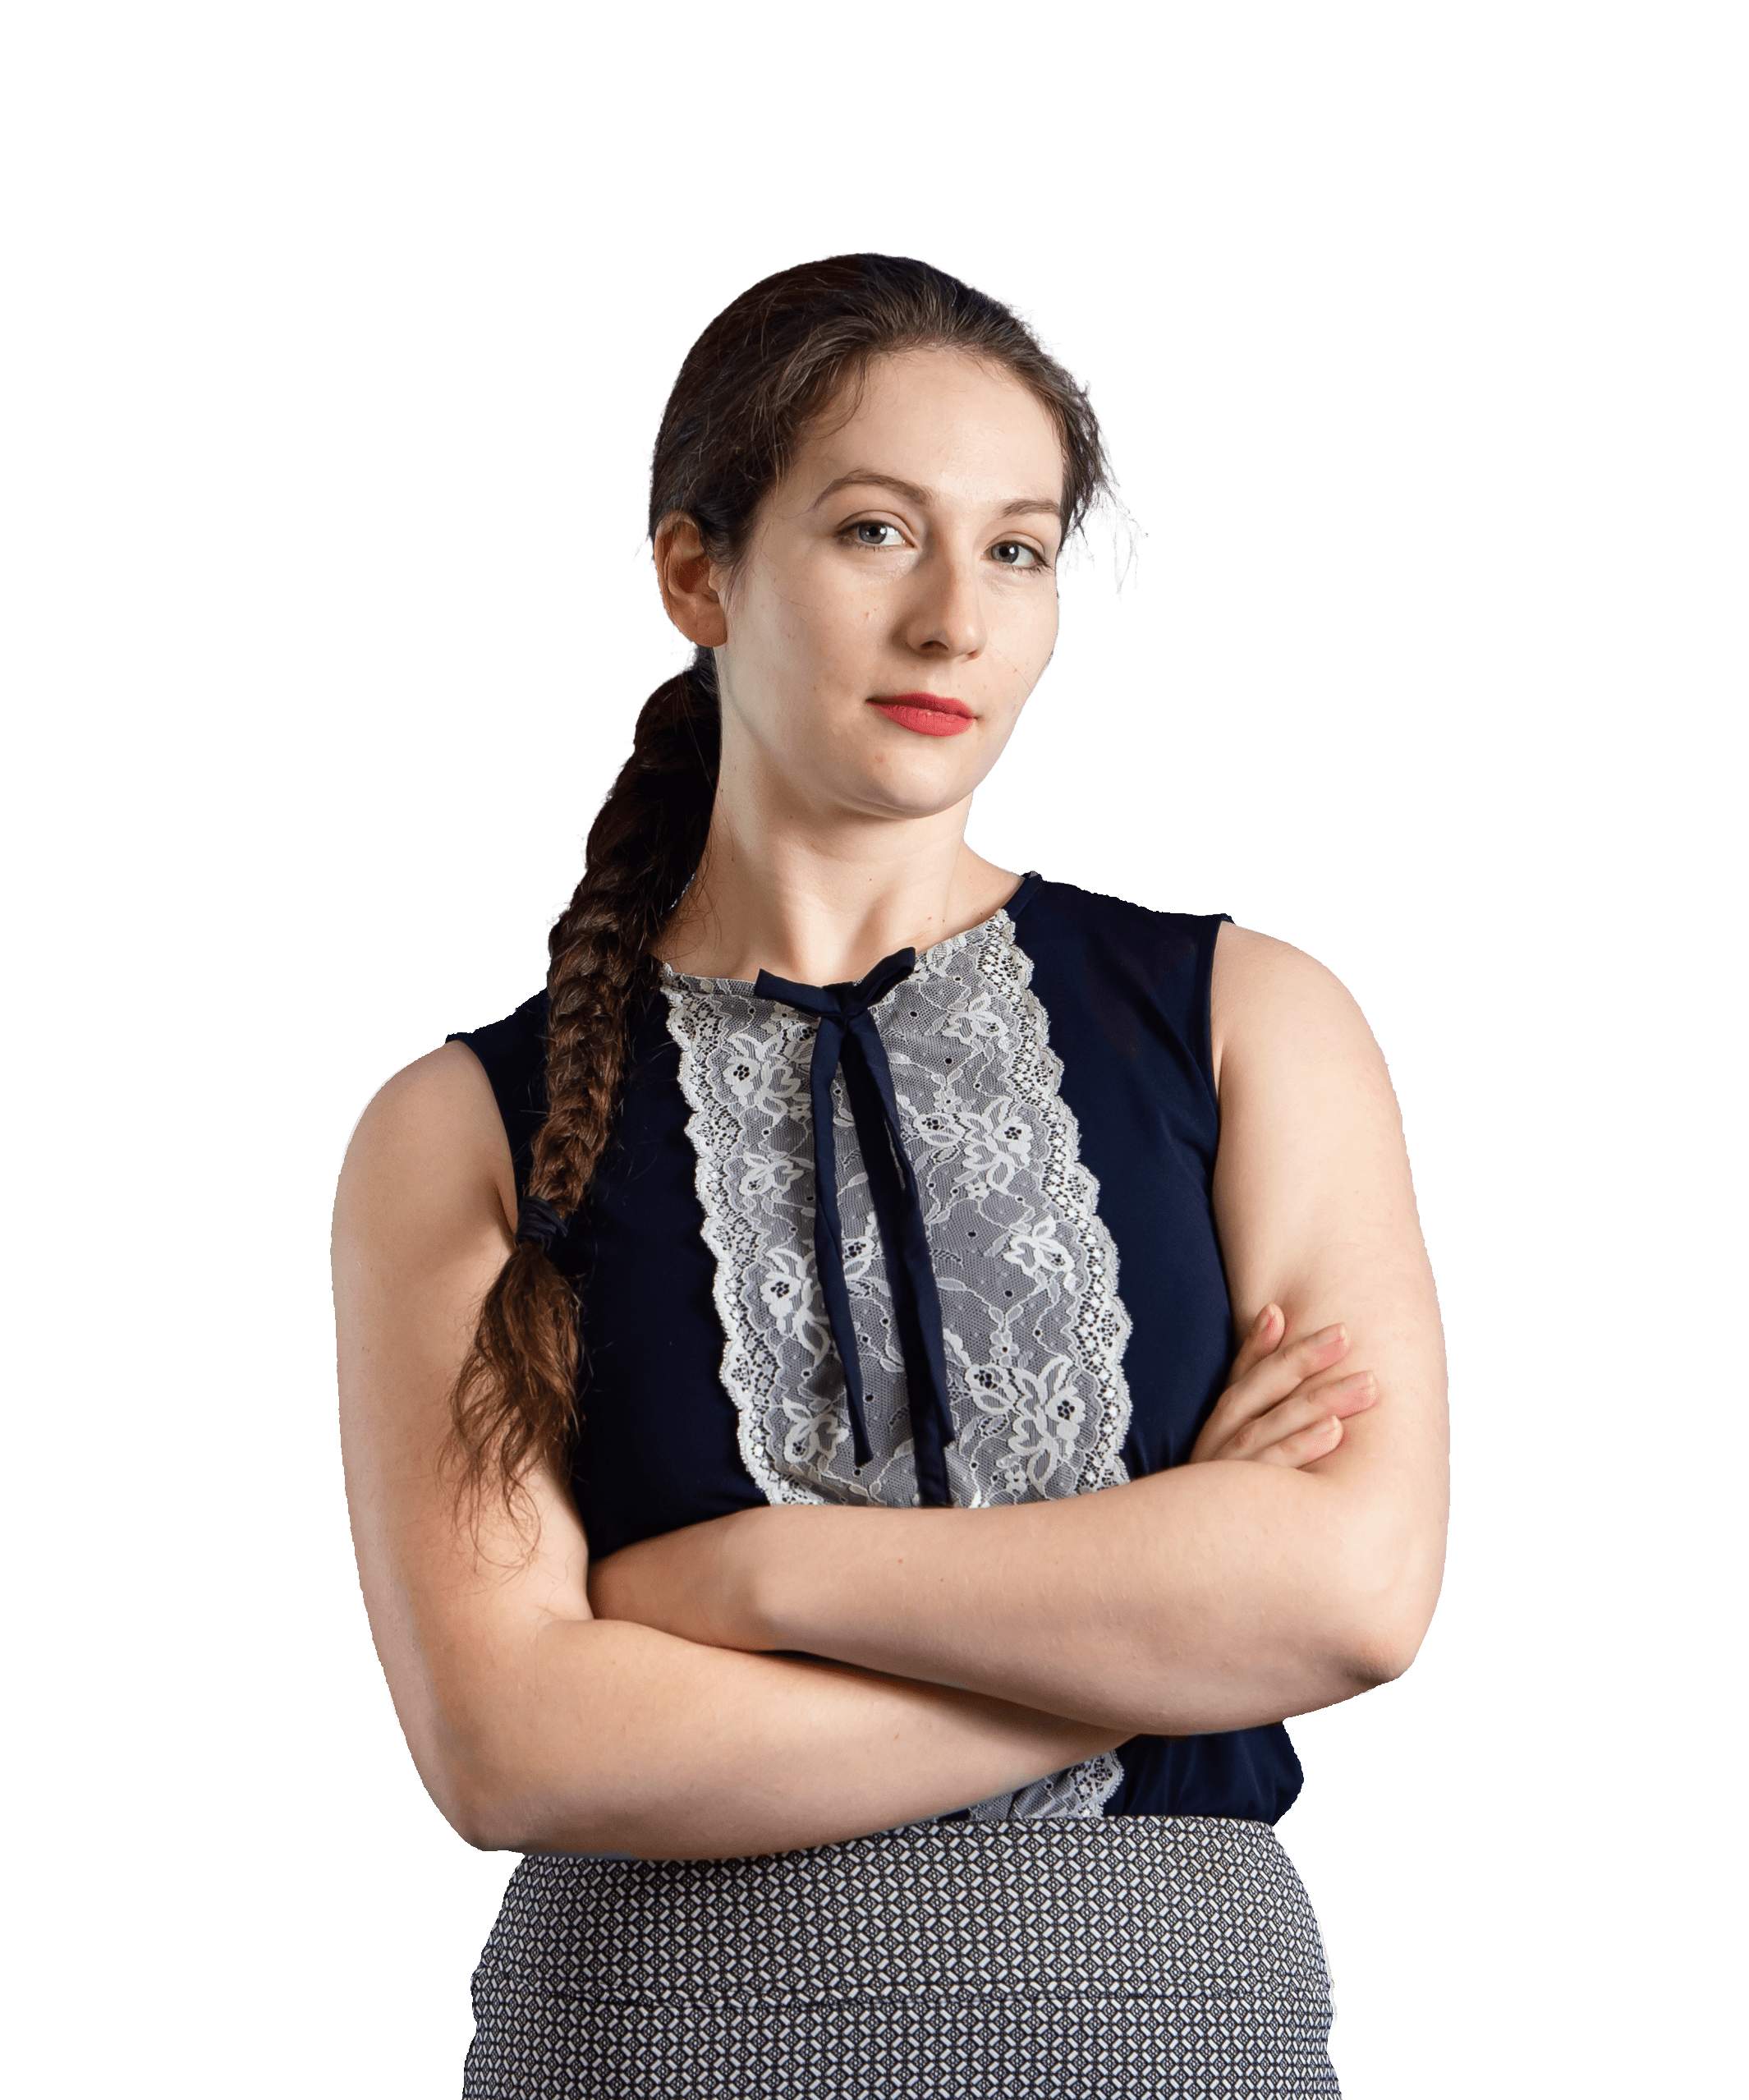 Victoria Paoloni digital marketing specialist at Potluck Consulting